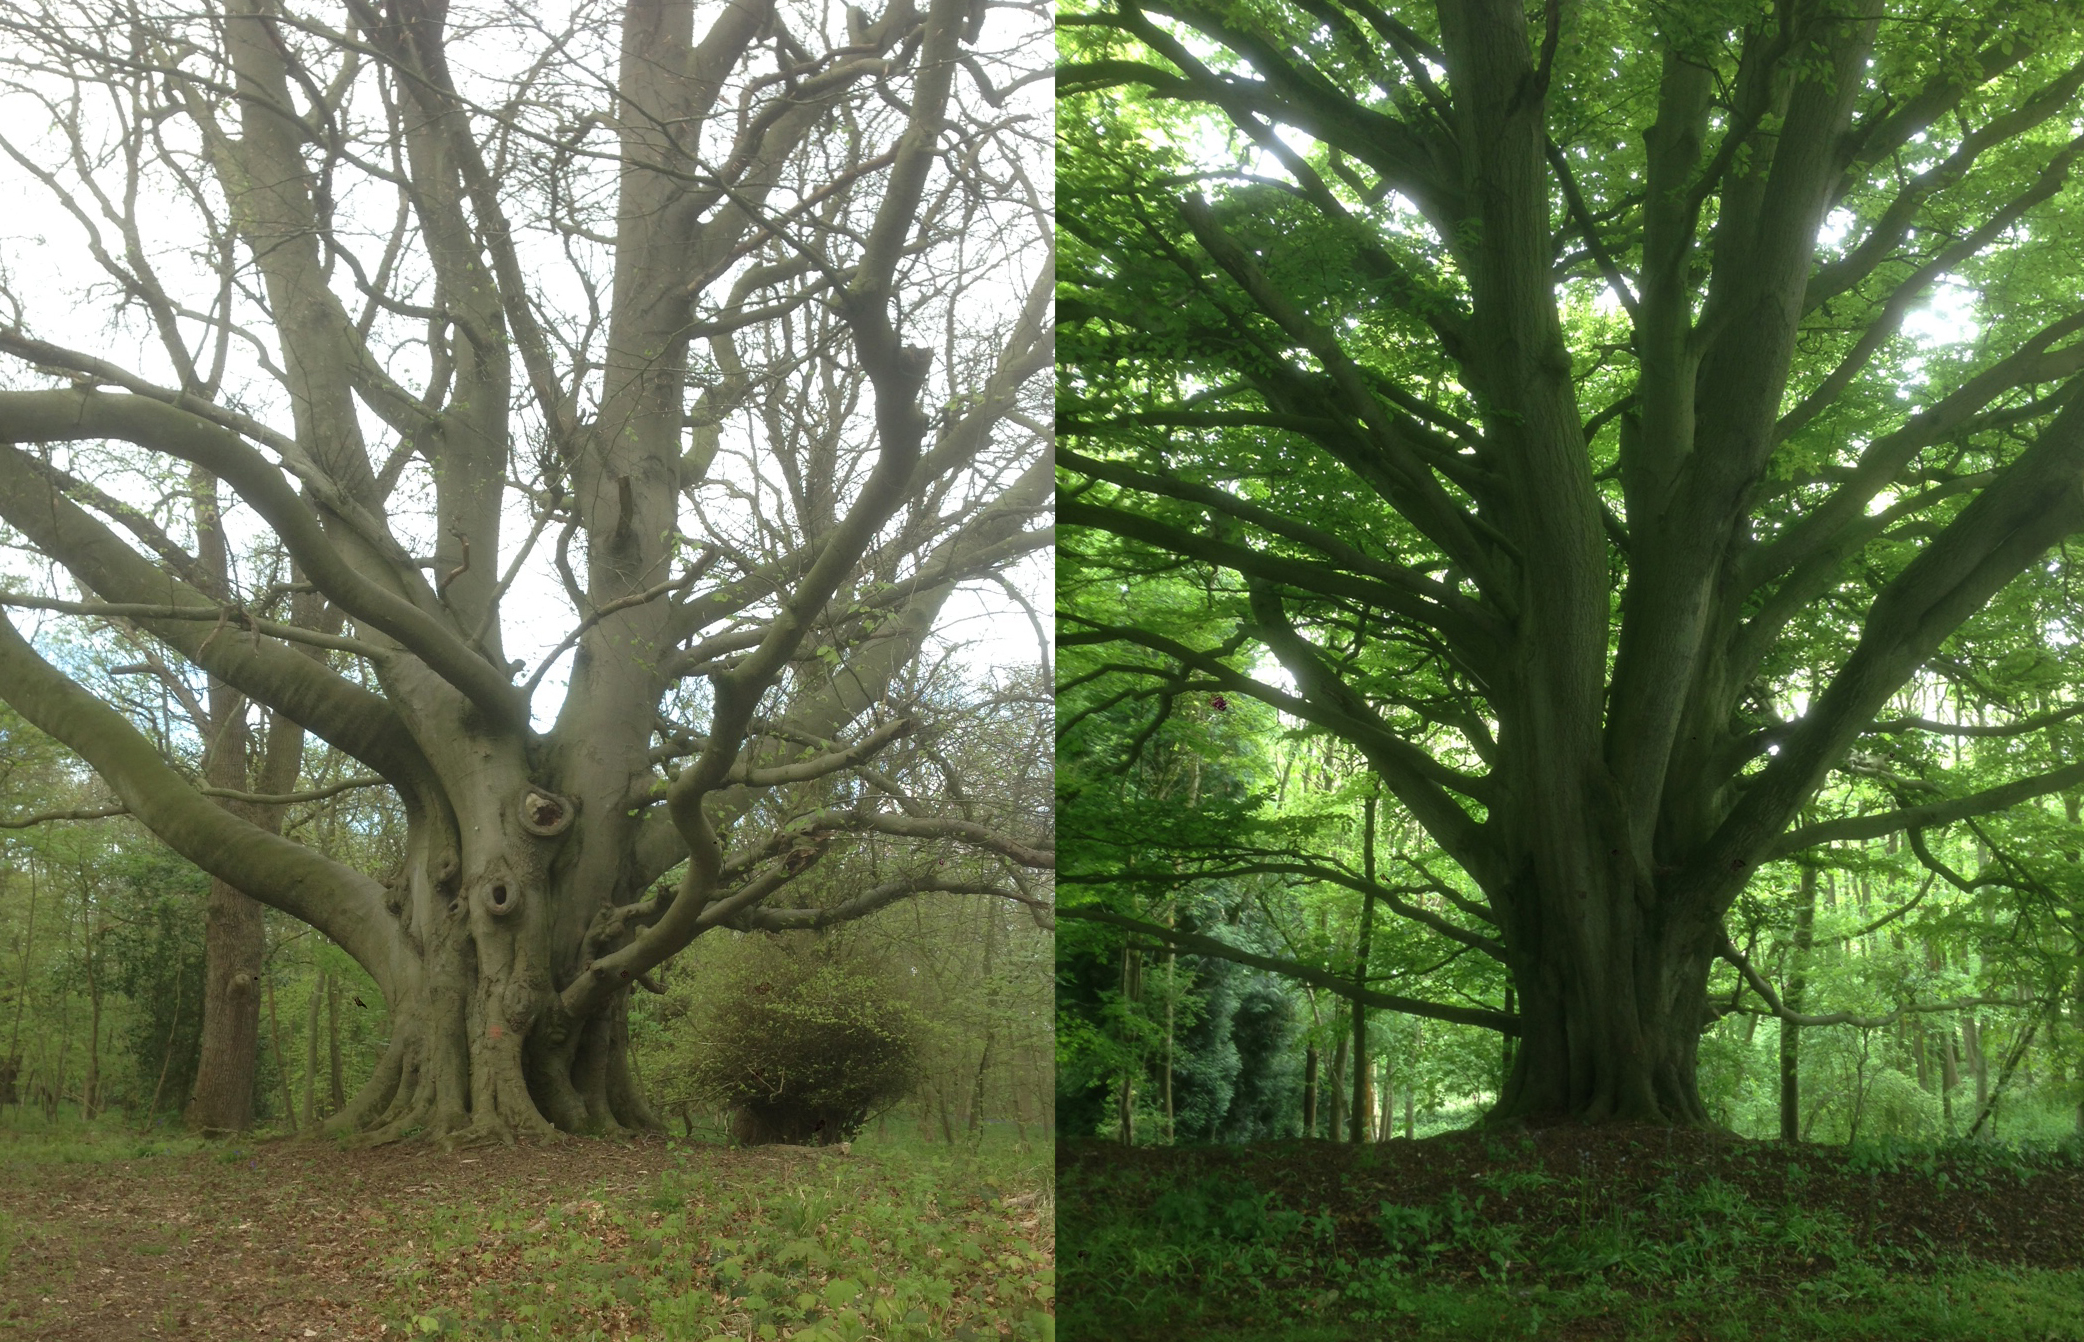 02A Wytham treeS